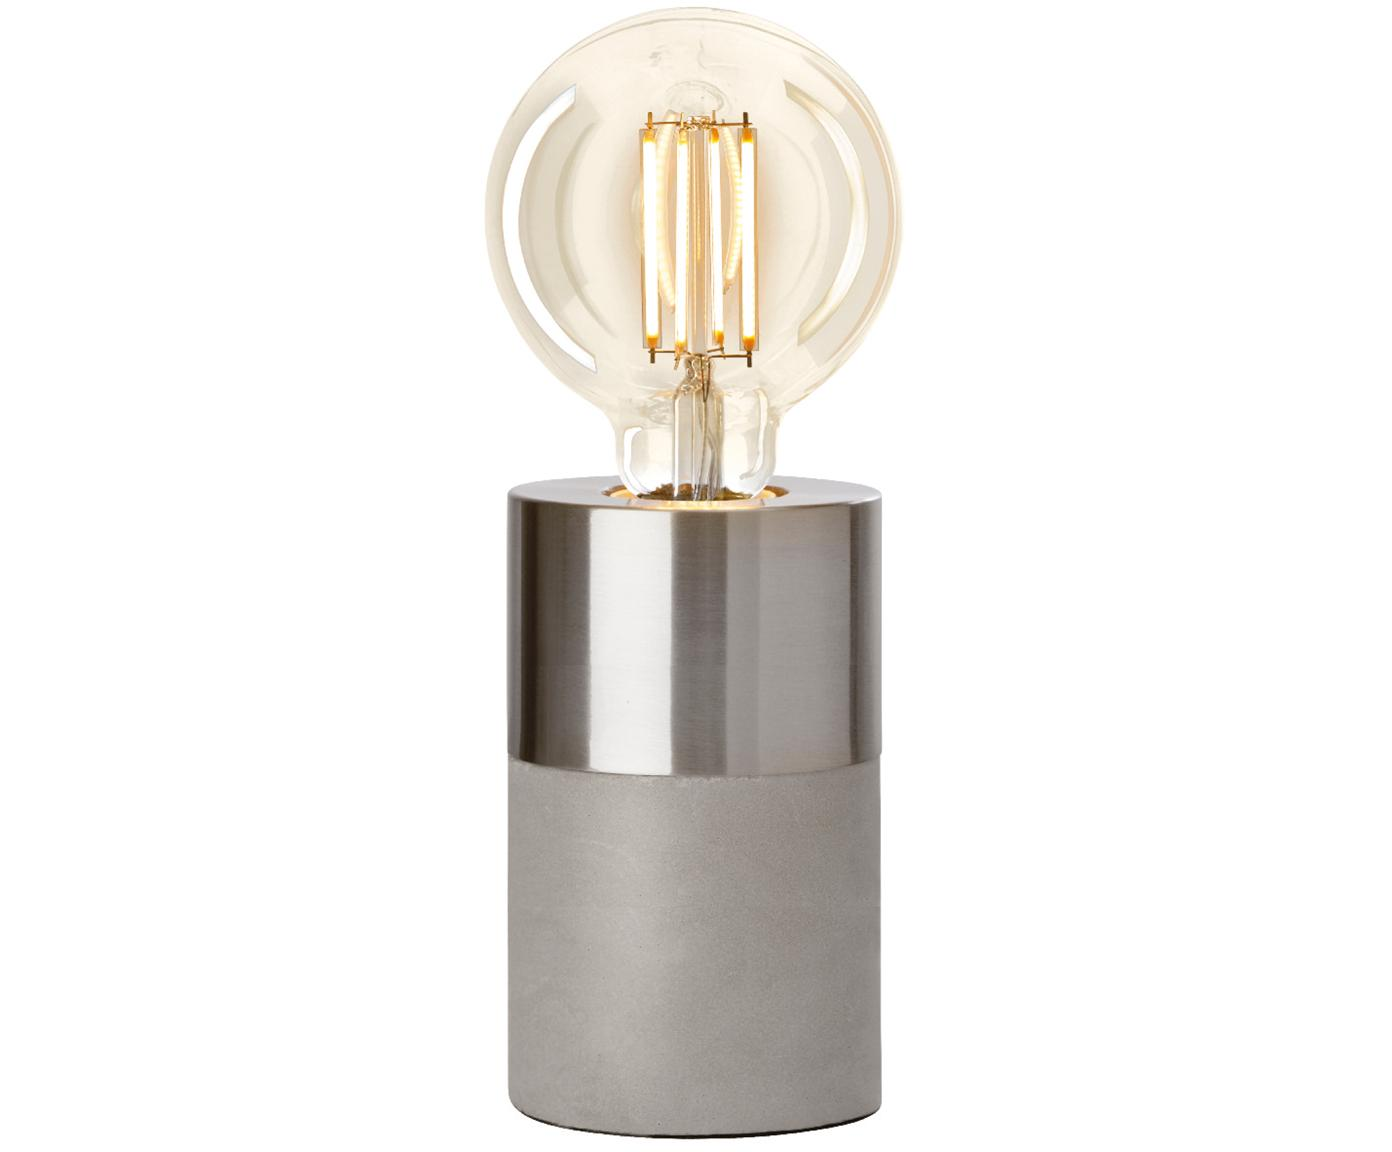 Betonnen tafellamp Athen, Grijs, chroomkleurig, Ø 8 x H 14 cm